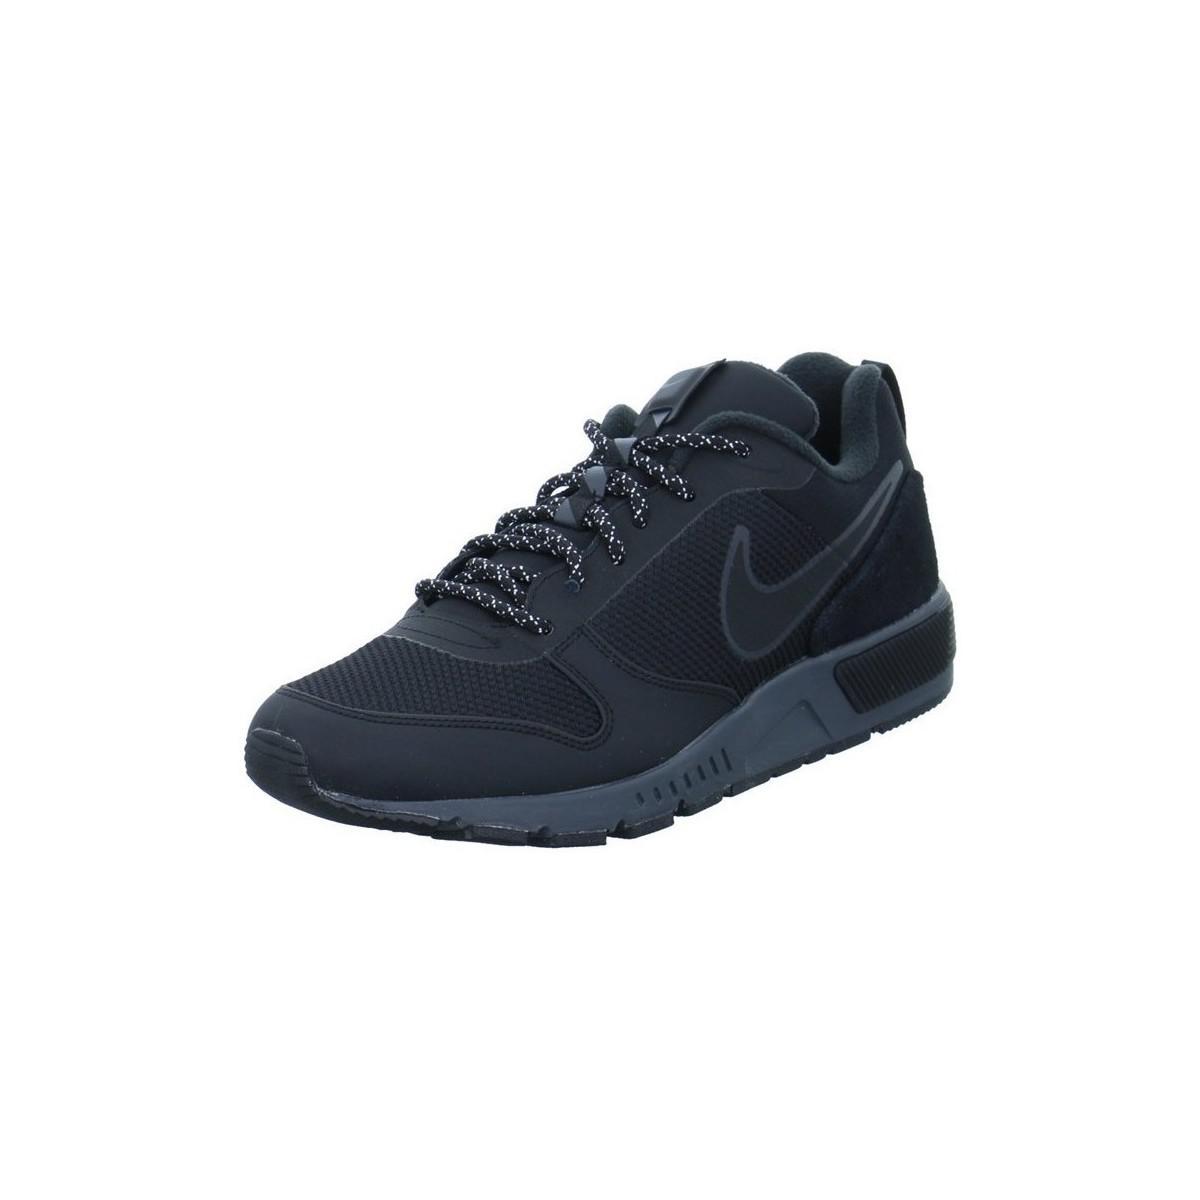 Nike Nightgazer Trail Women s Shoes (trainers) In Black in Black - Lyst e88fe322e